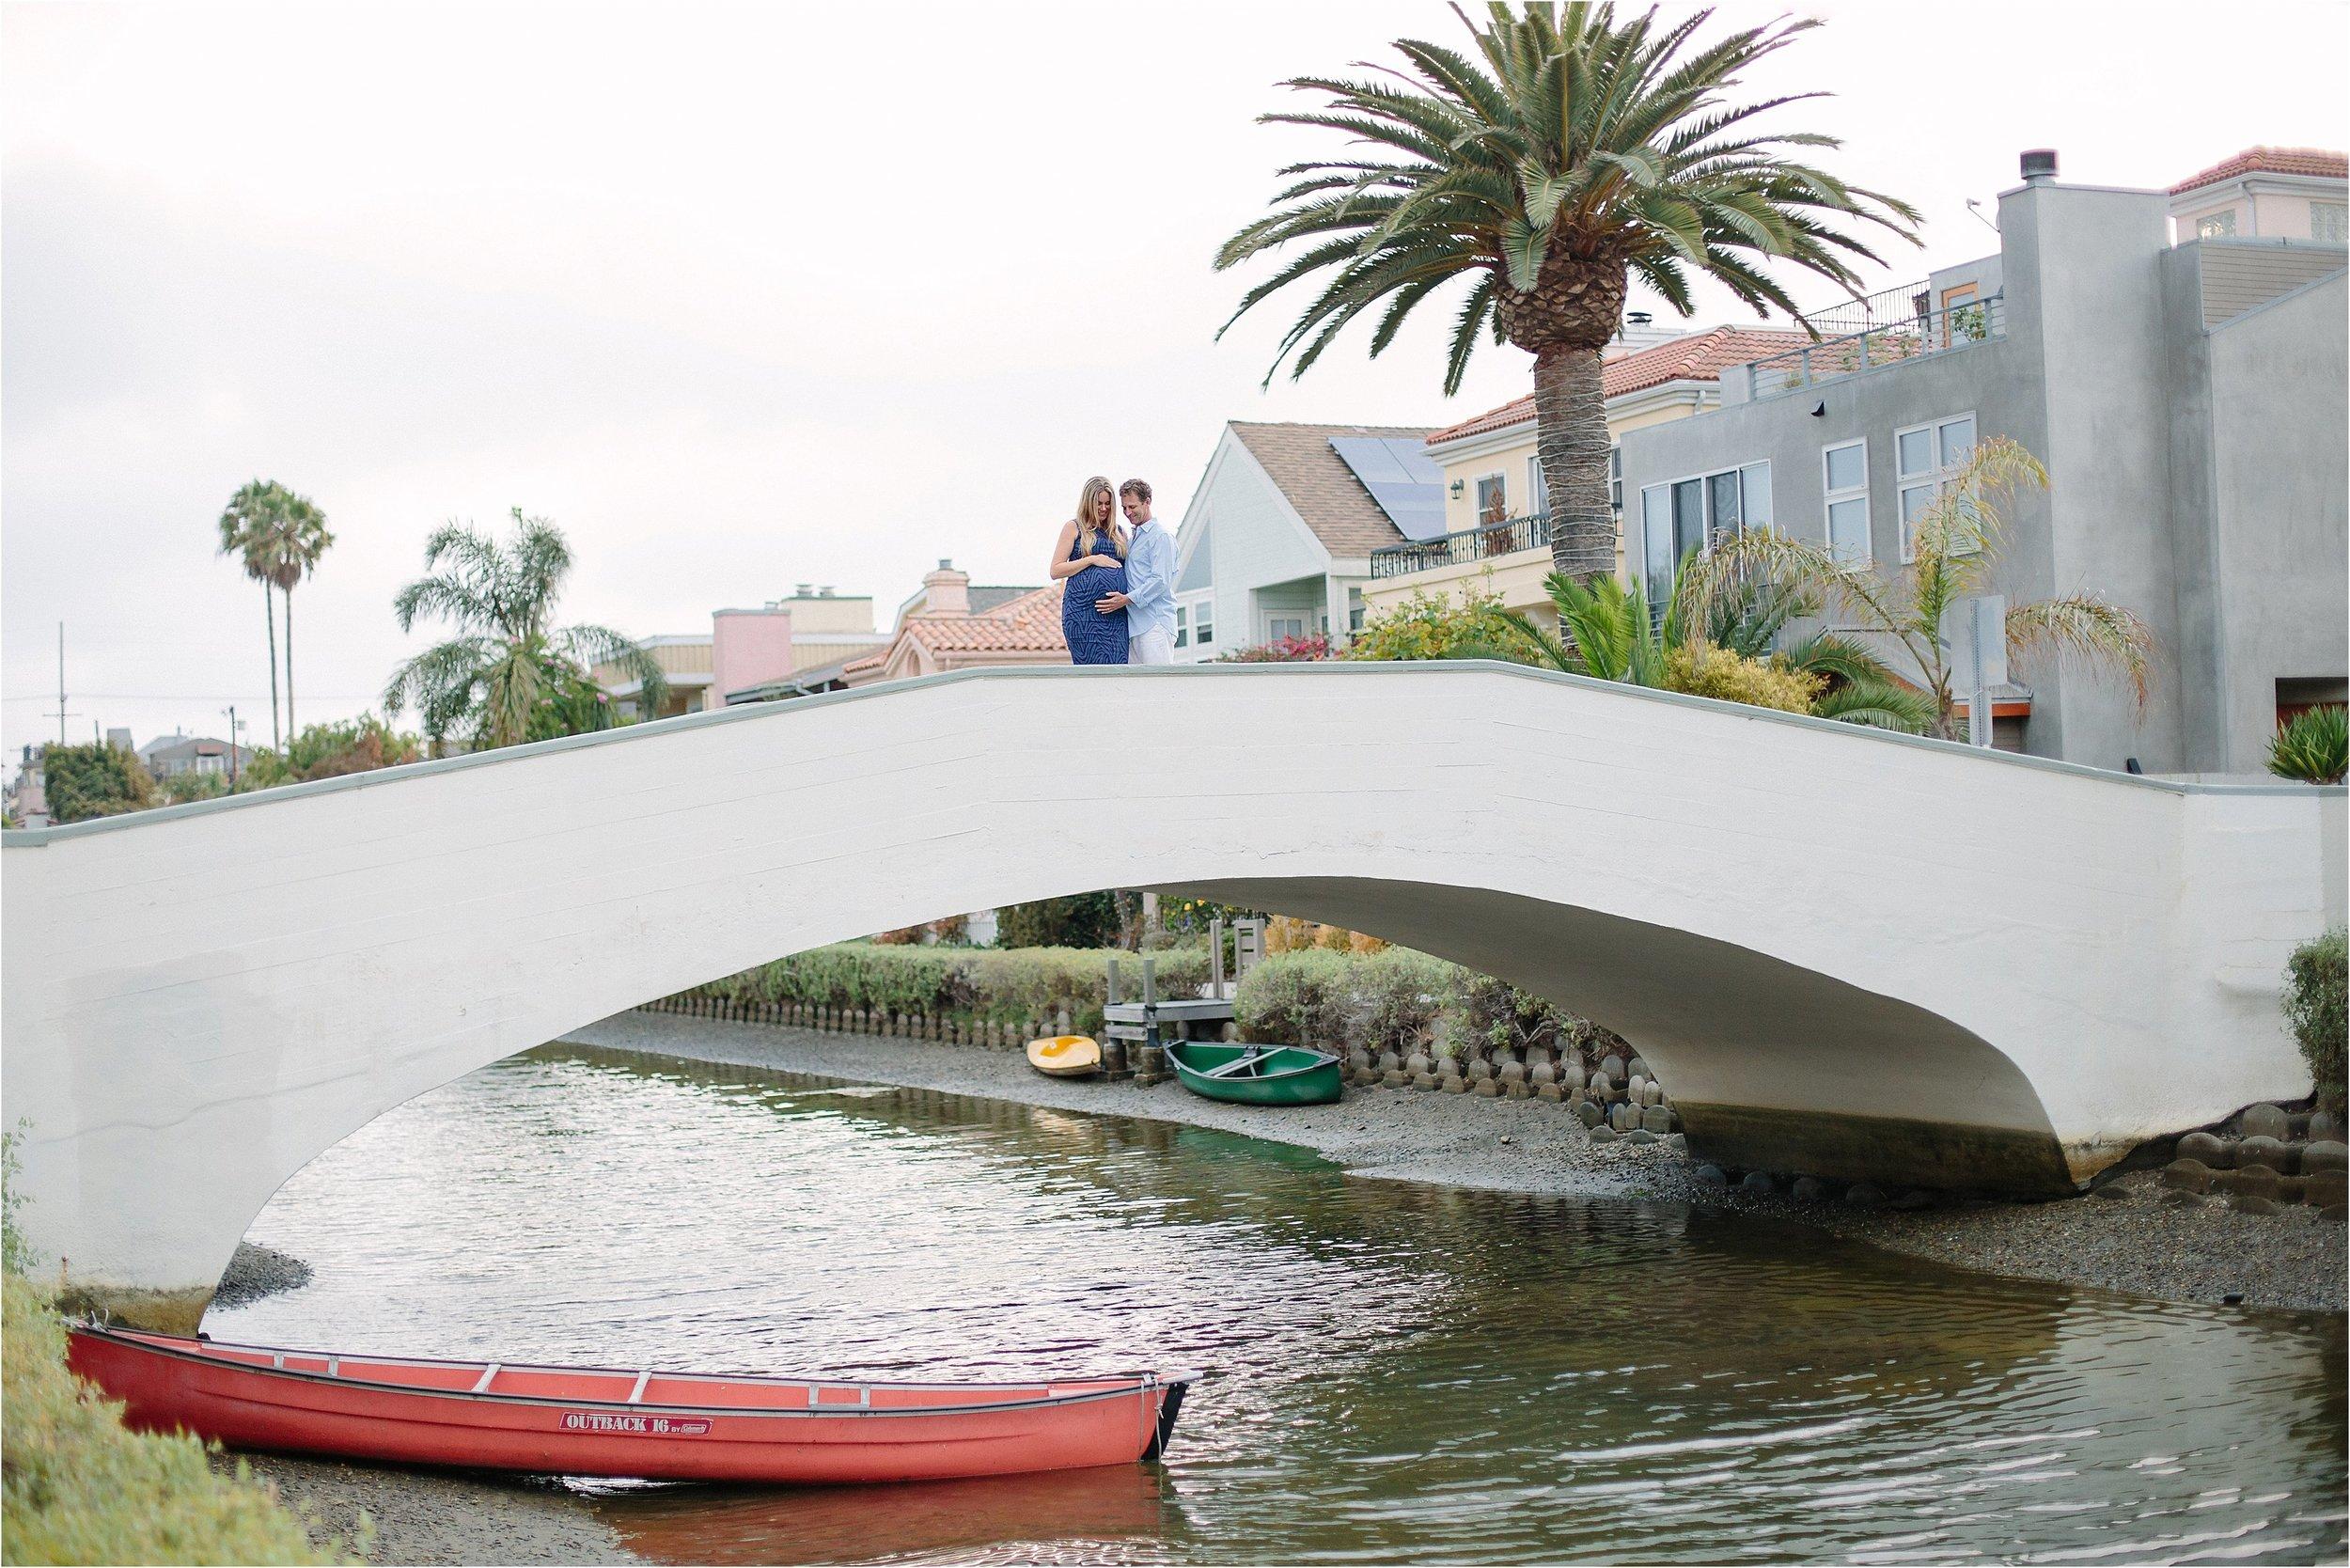 Venice Canals Bridge Photo